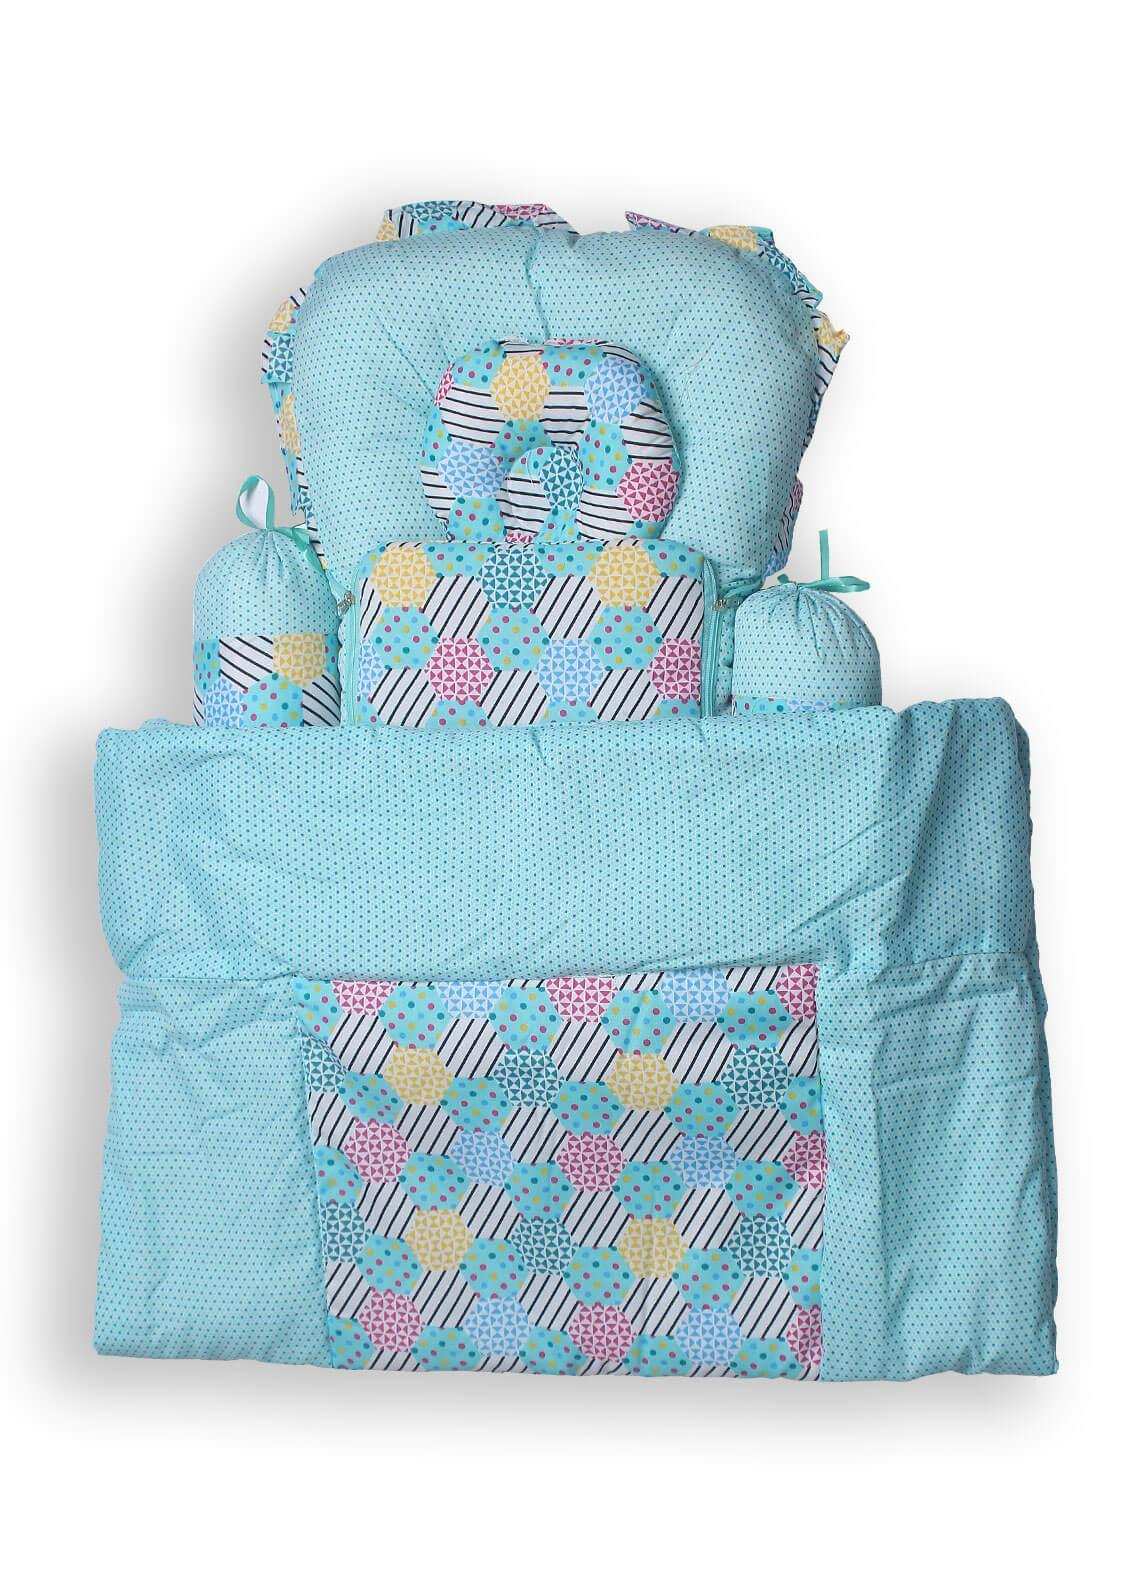 Plush Mink  Fiber Baby Set 7 Pieces PEEKABOO 7 PIECES BABY SET Light Blue - Baby Products